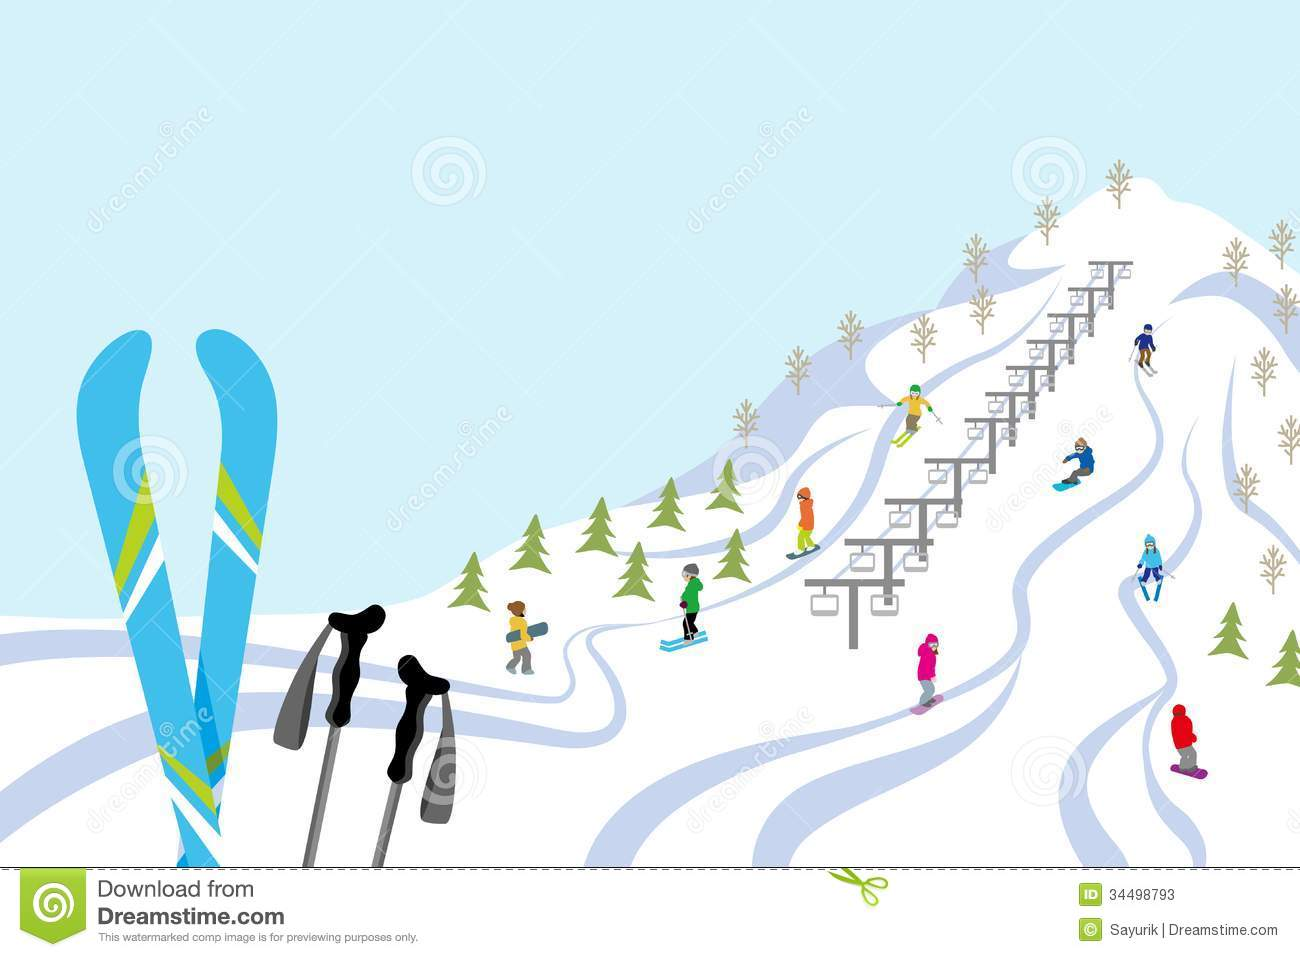 Ski resort clipart - Clipground